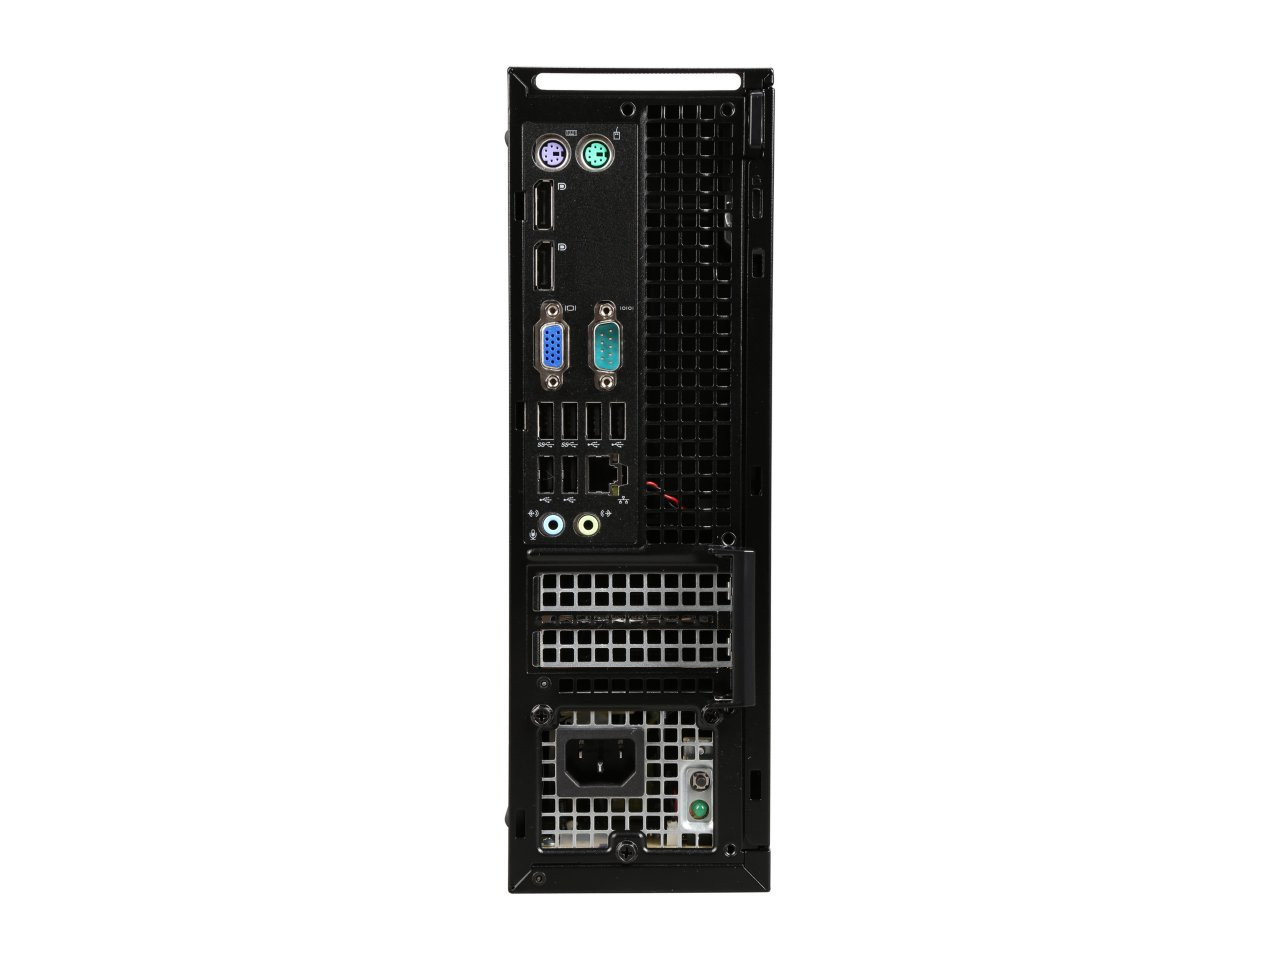 Dell Optiplex 9020 SFF Quad Core i7 3.4GHz, 8GB Ram, 500GB HDD, DVD-RW, Windows 10 Pro 64 Desktop Computer